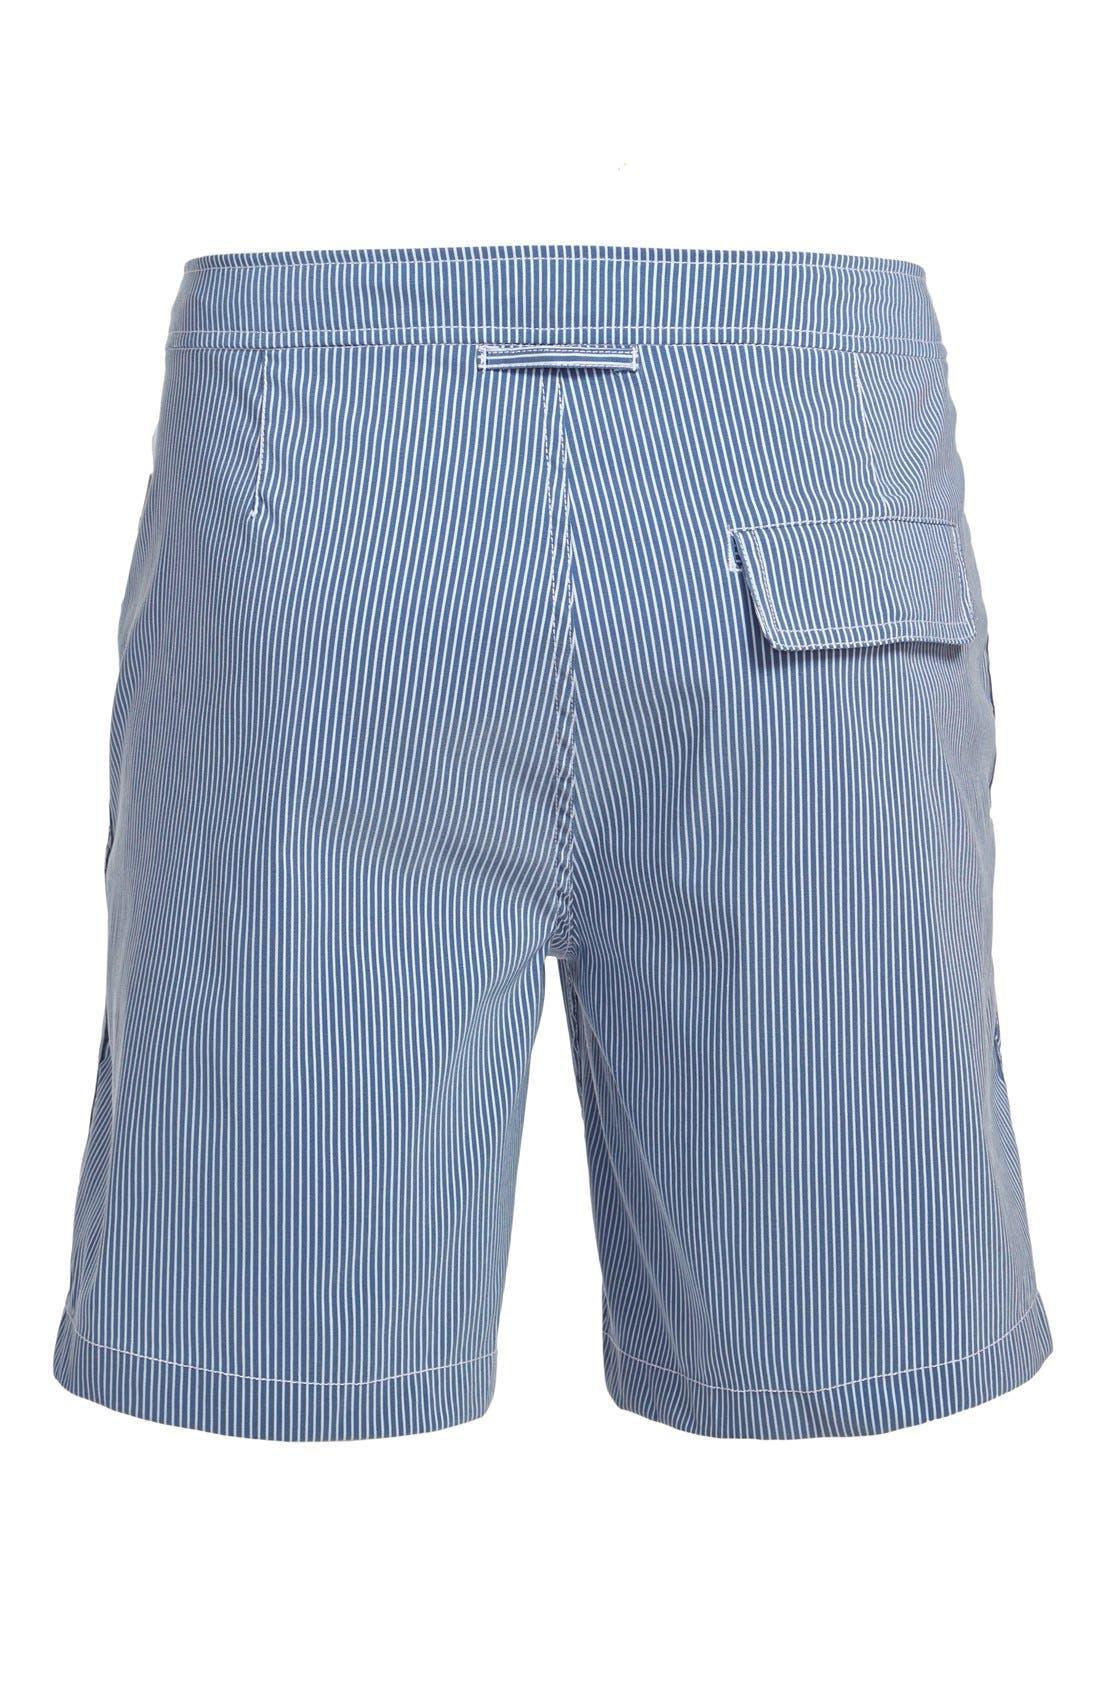 "'Calder 7.5""' Board Shorts,                             Alternate thumbnail 5, color,                             450"